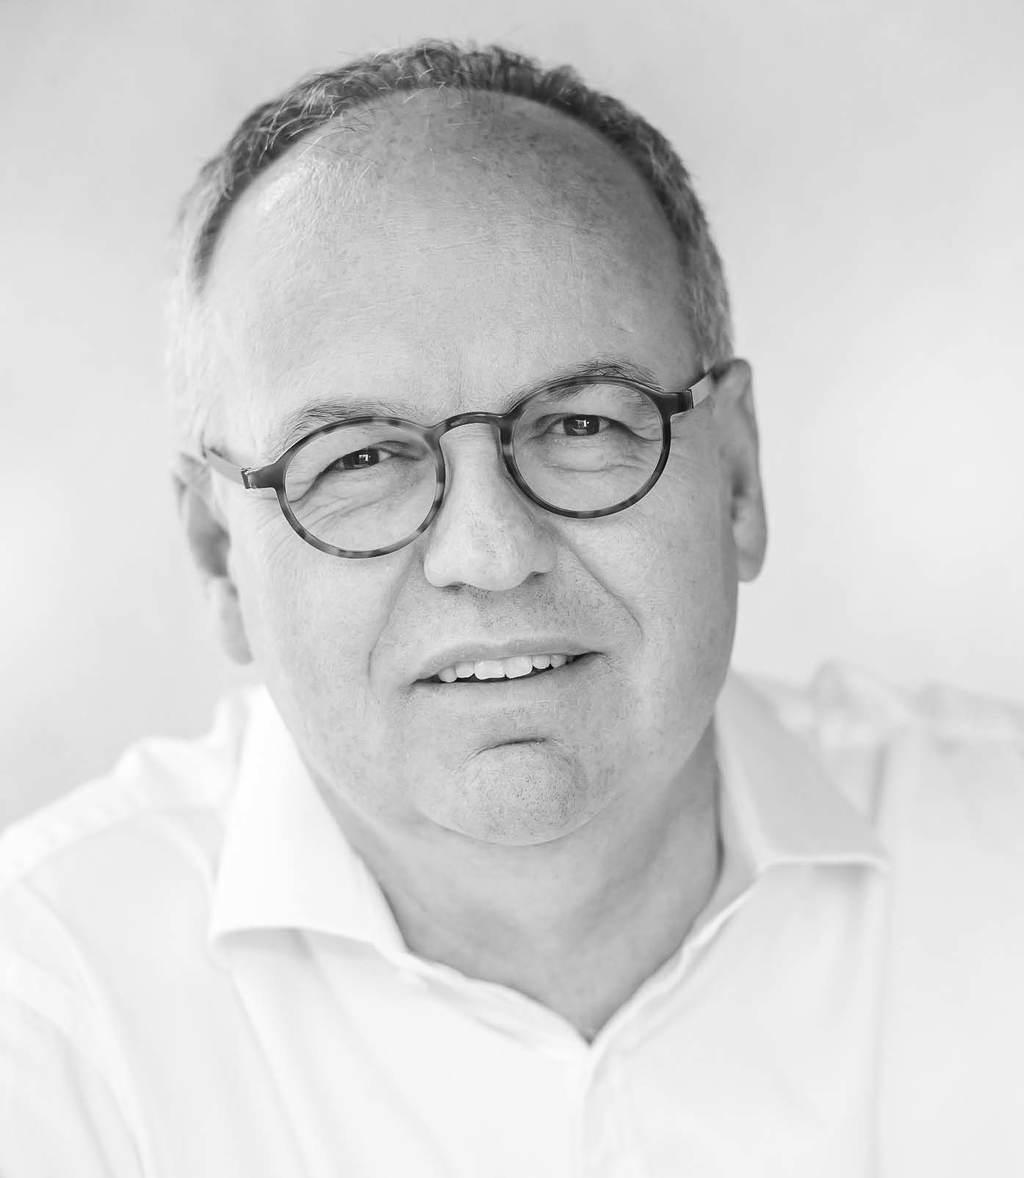 Berthold Dörrich